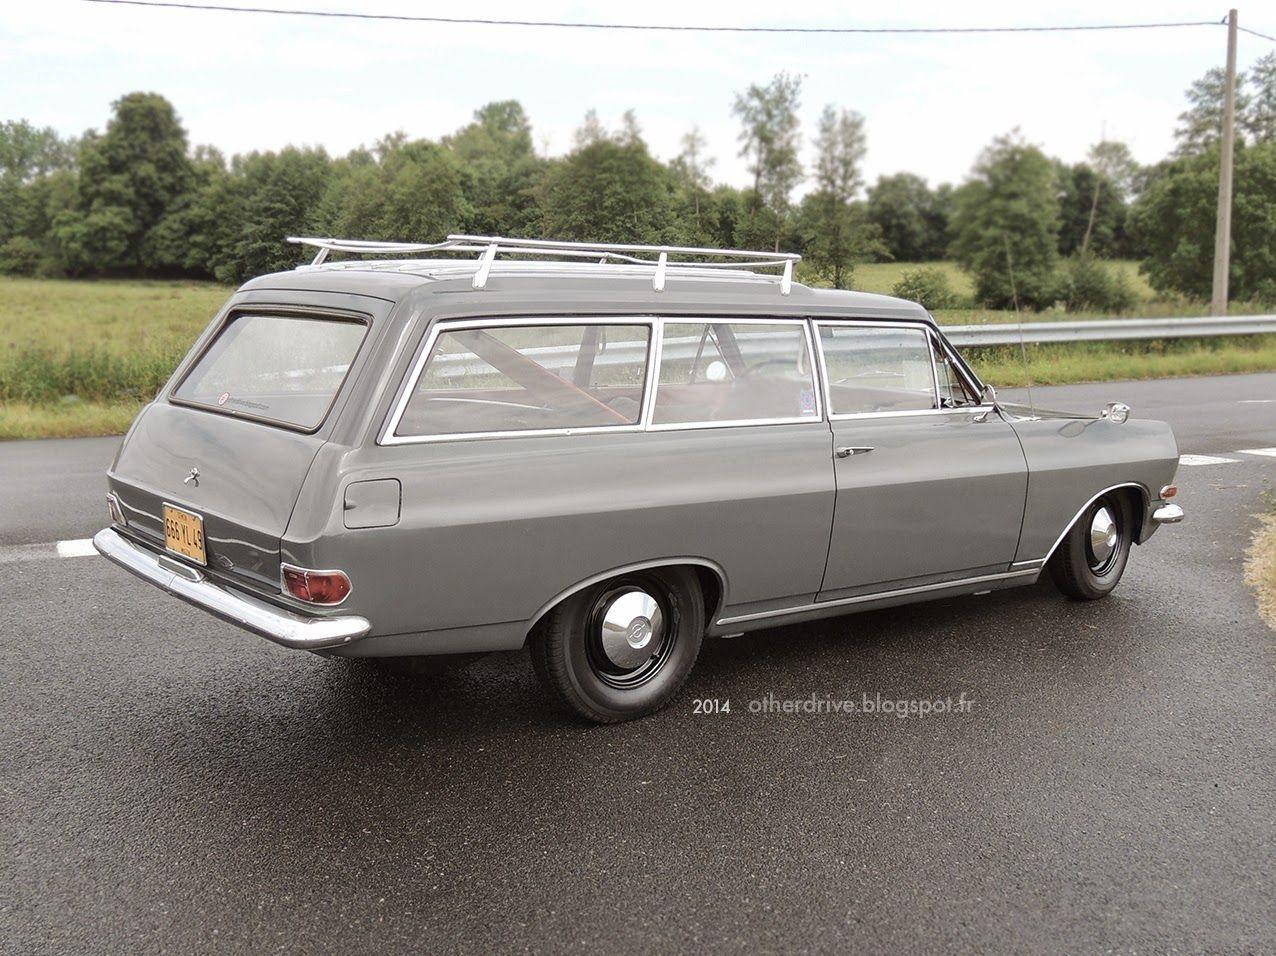 Opel rekord b caravan fahrzeug pinterest station wagon opel rekord b caravan station wagonluxury sciox Choice Image